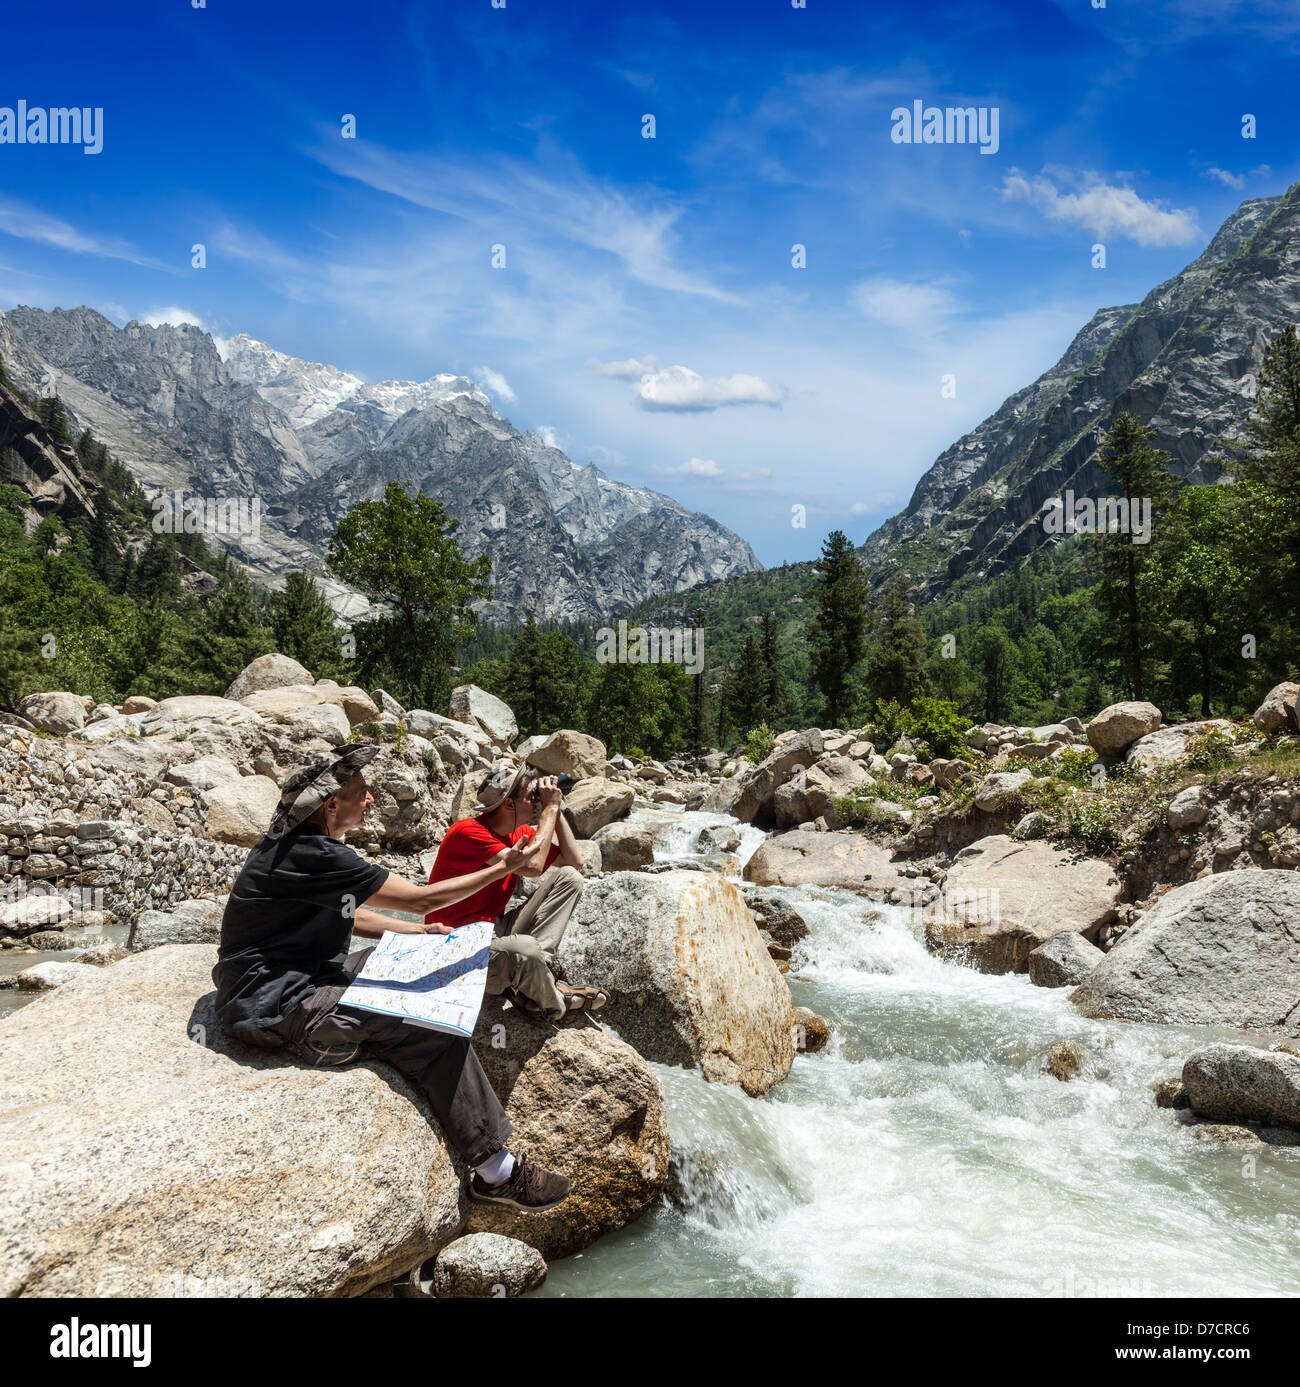 Hiker trekkers read a trekking map on trek in Himalayas mountains. Himachal Pradesh,India - Stock Image